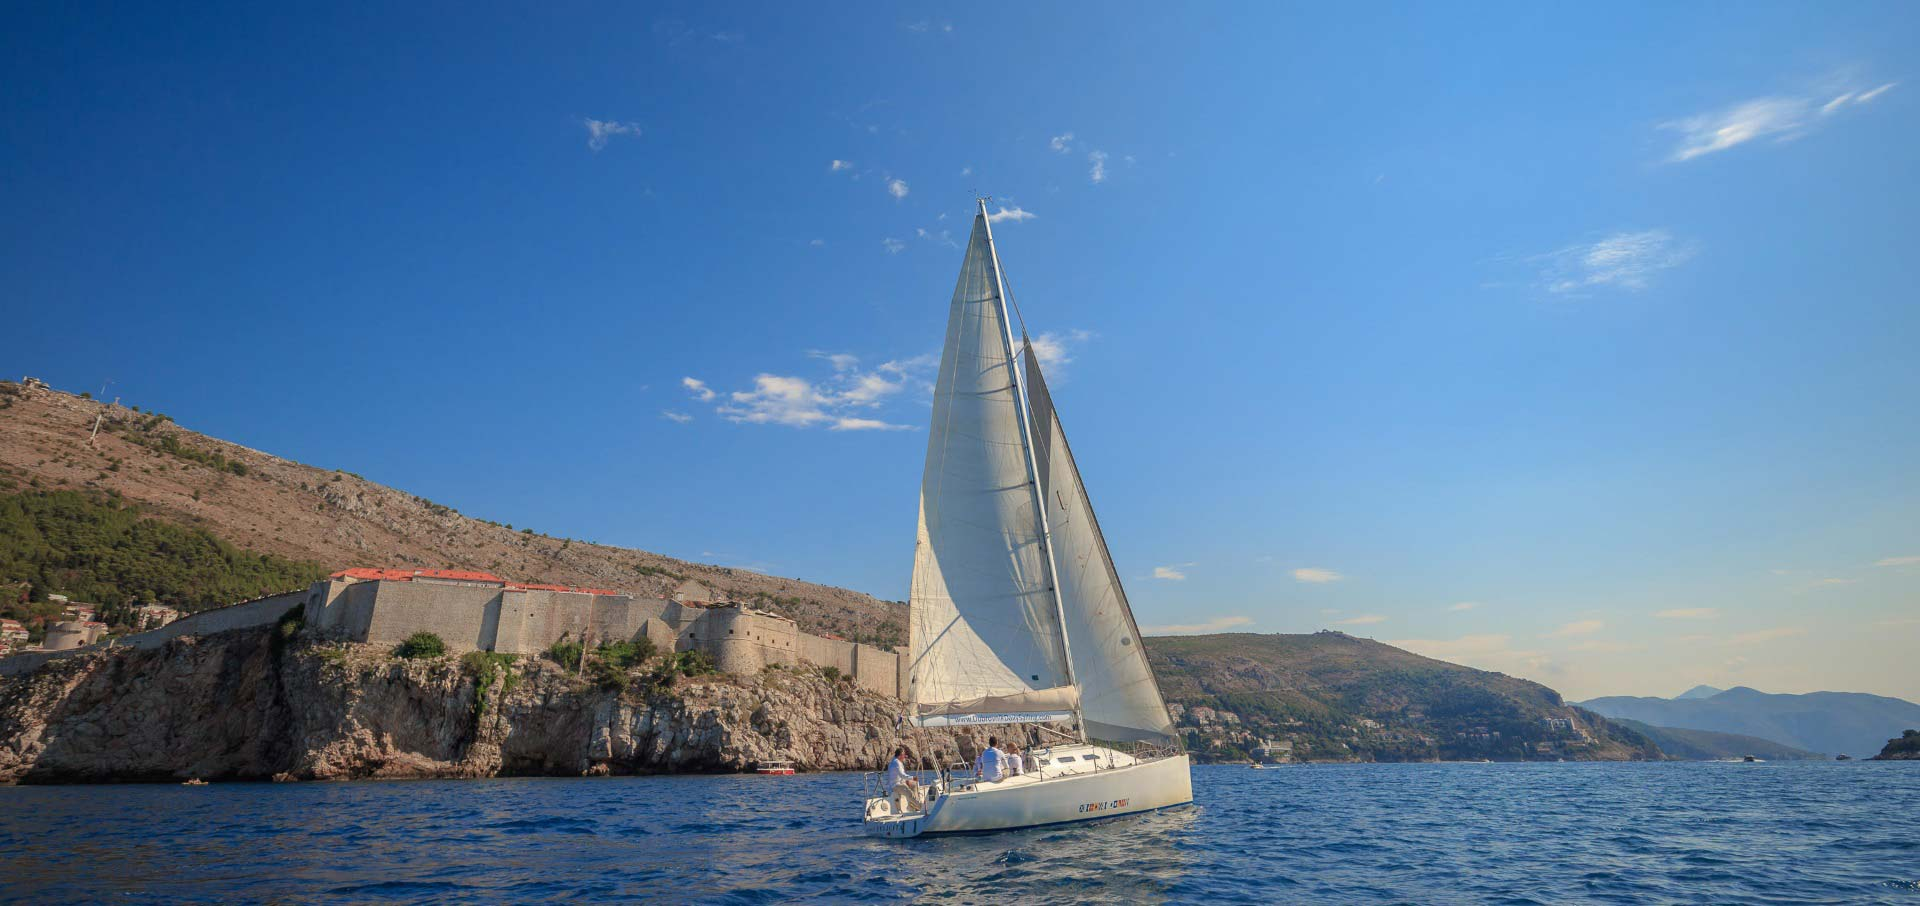 Sightseeing Dubrovnik on sailboat Dubrovnik Daily Sailing